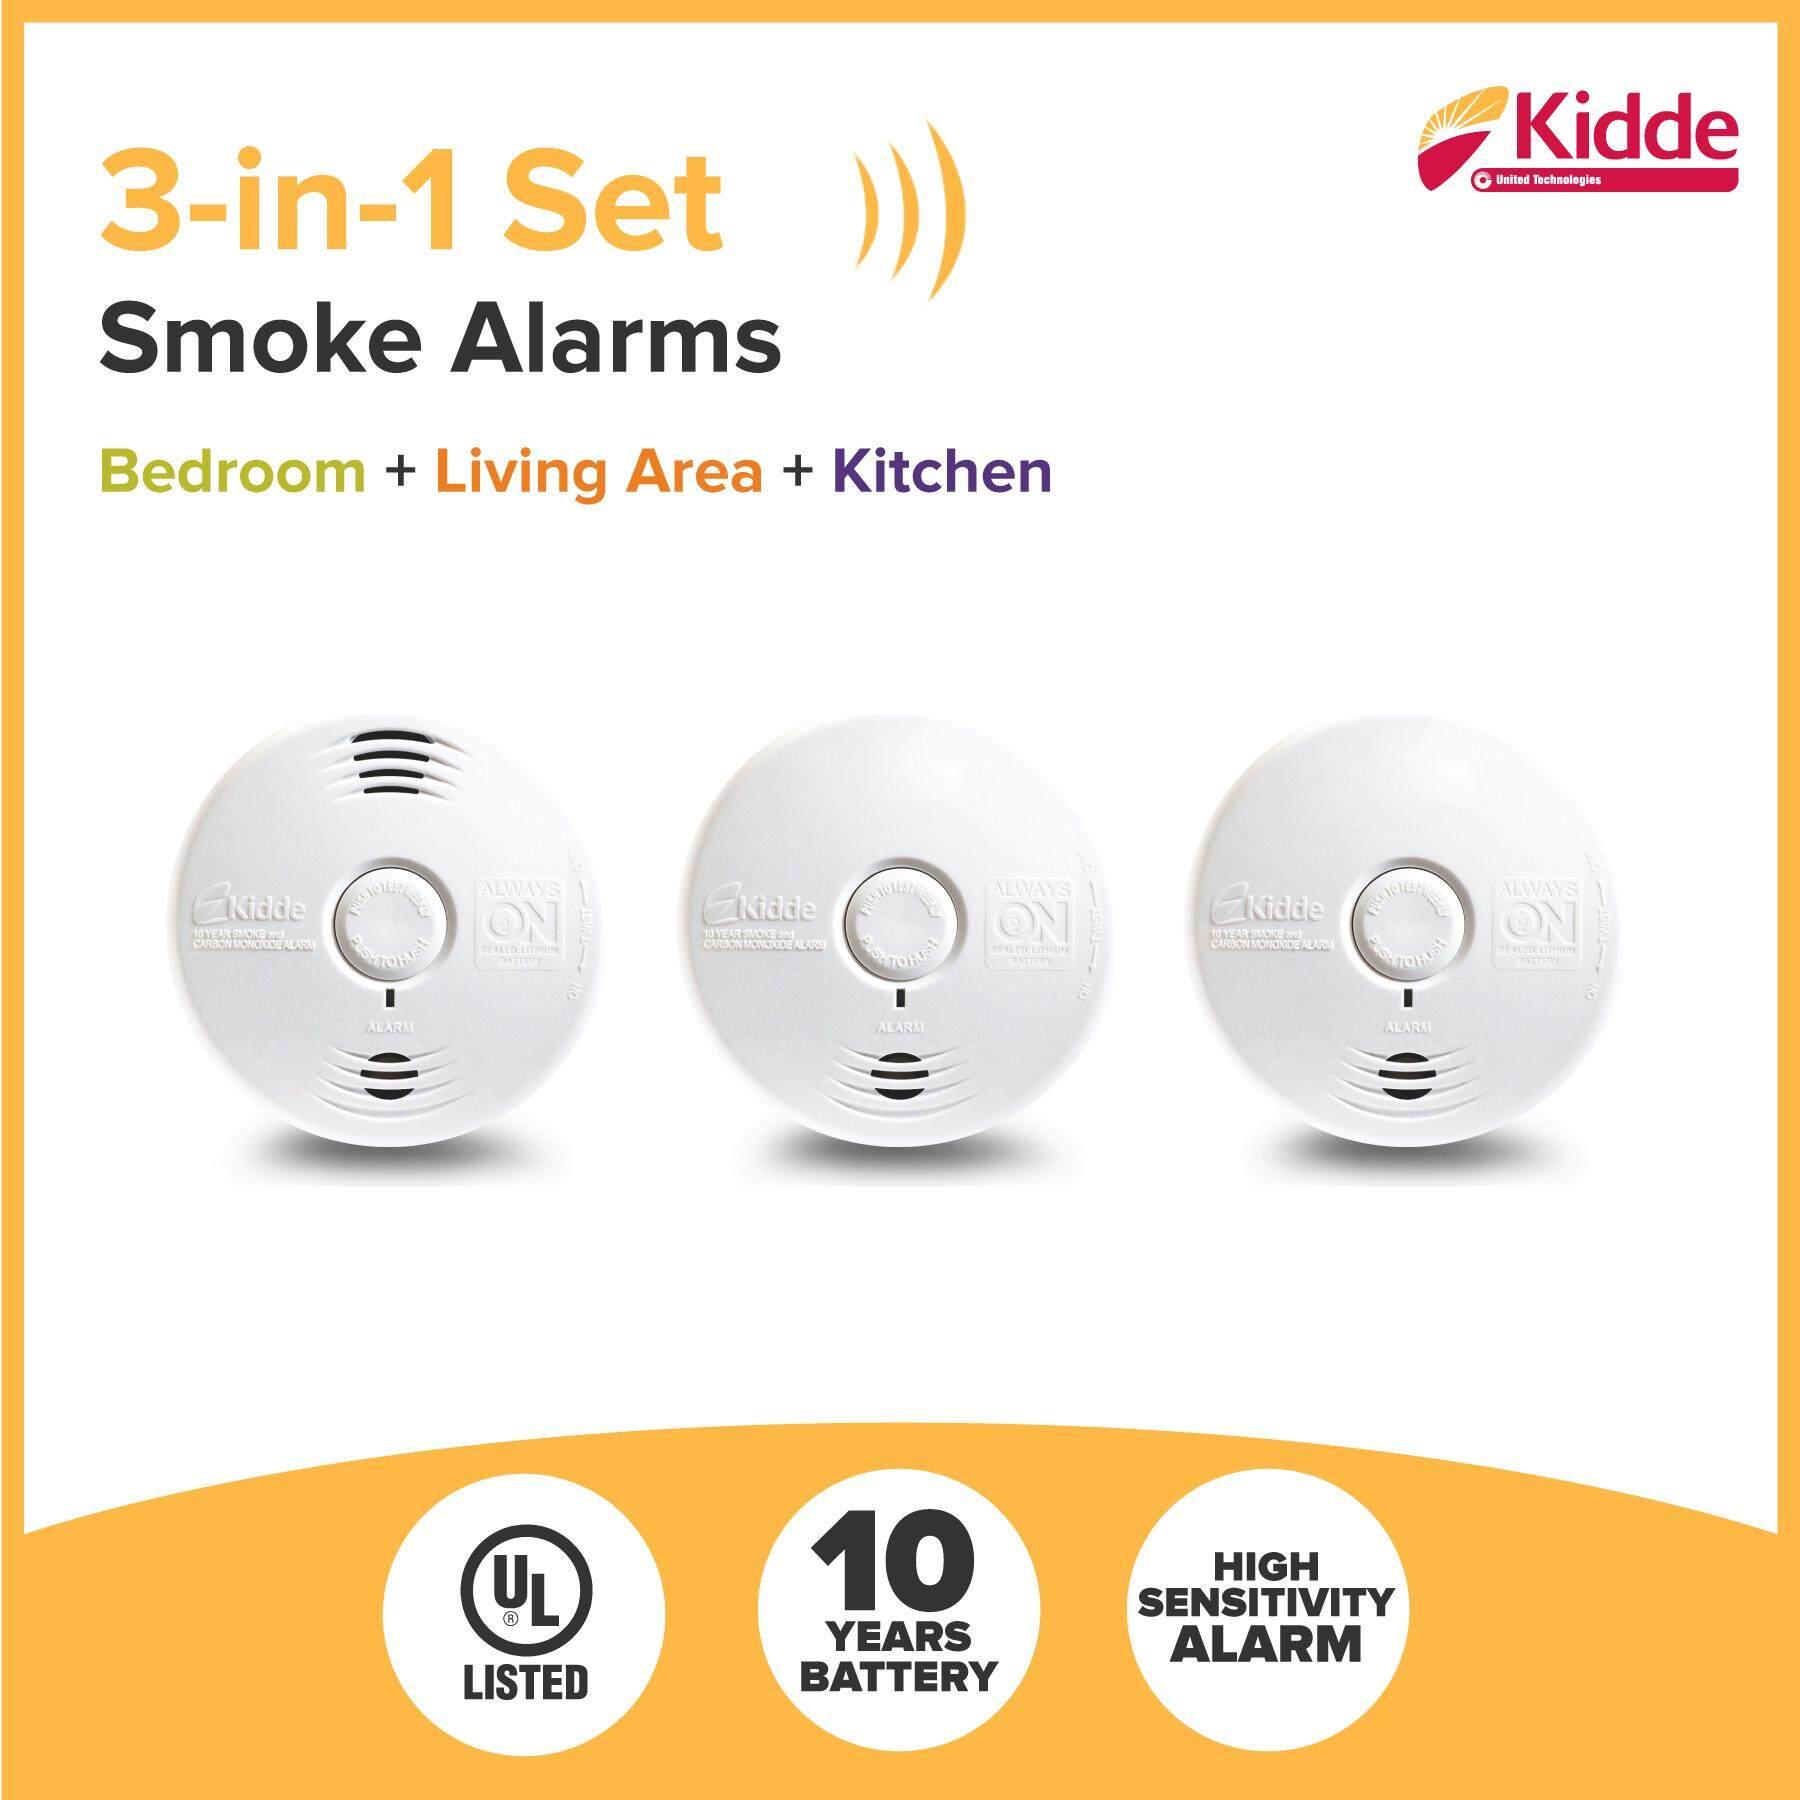 KIDDE Smoke Alarm Detector 3-in-1 set (Smoke Alarm + Fire! Fire ! Voice Smoke Alarm + Smoke & CO)  [3-in-1], 10 Years Battery, UL listed